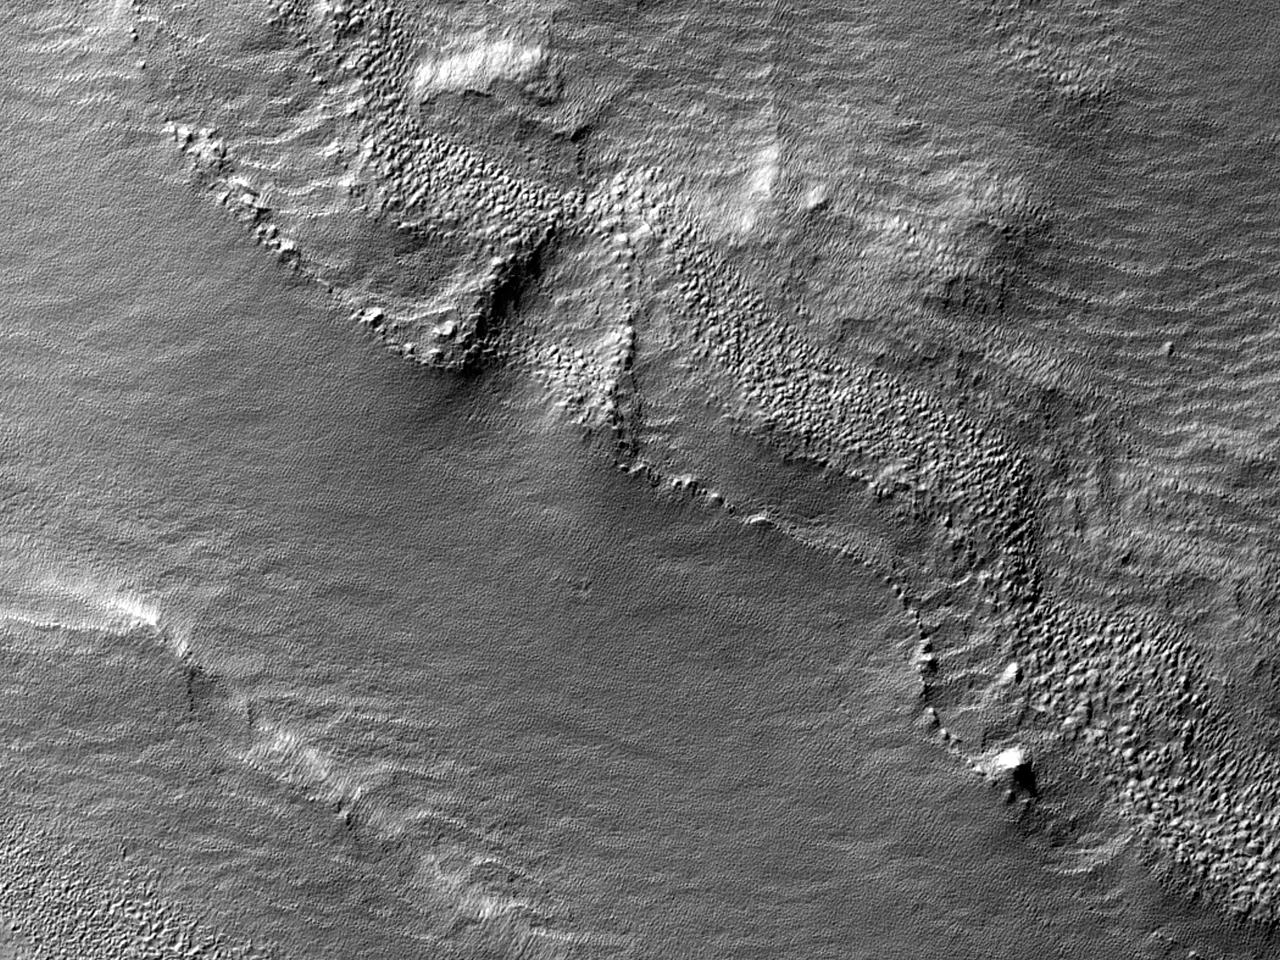 Straturi cutate într-un crater în Terra Cimmeria